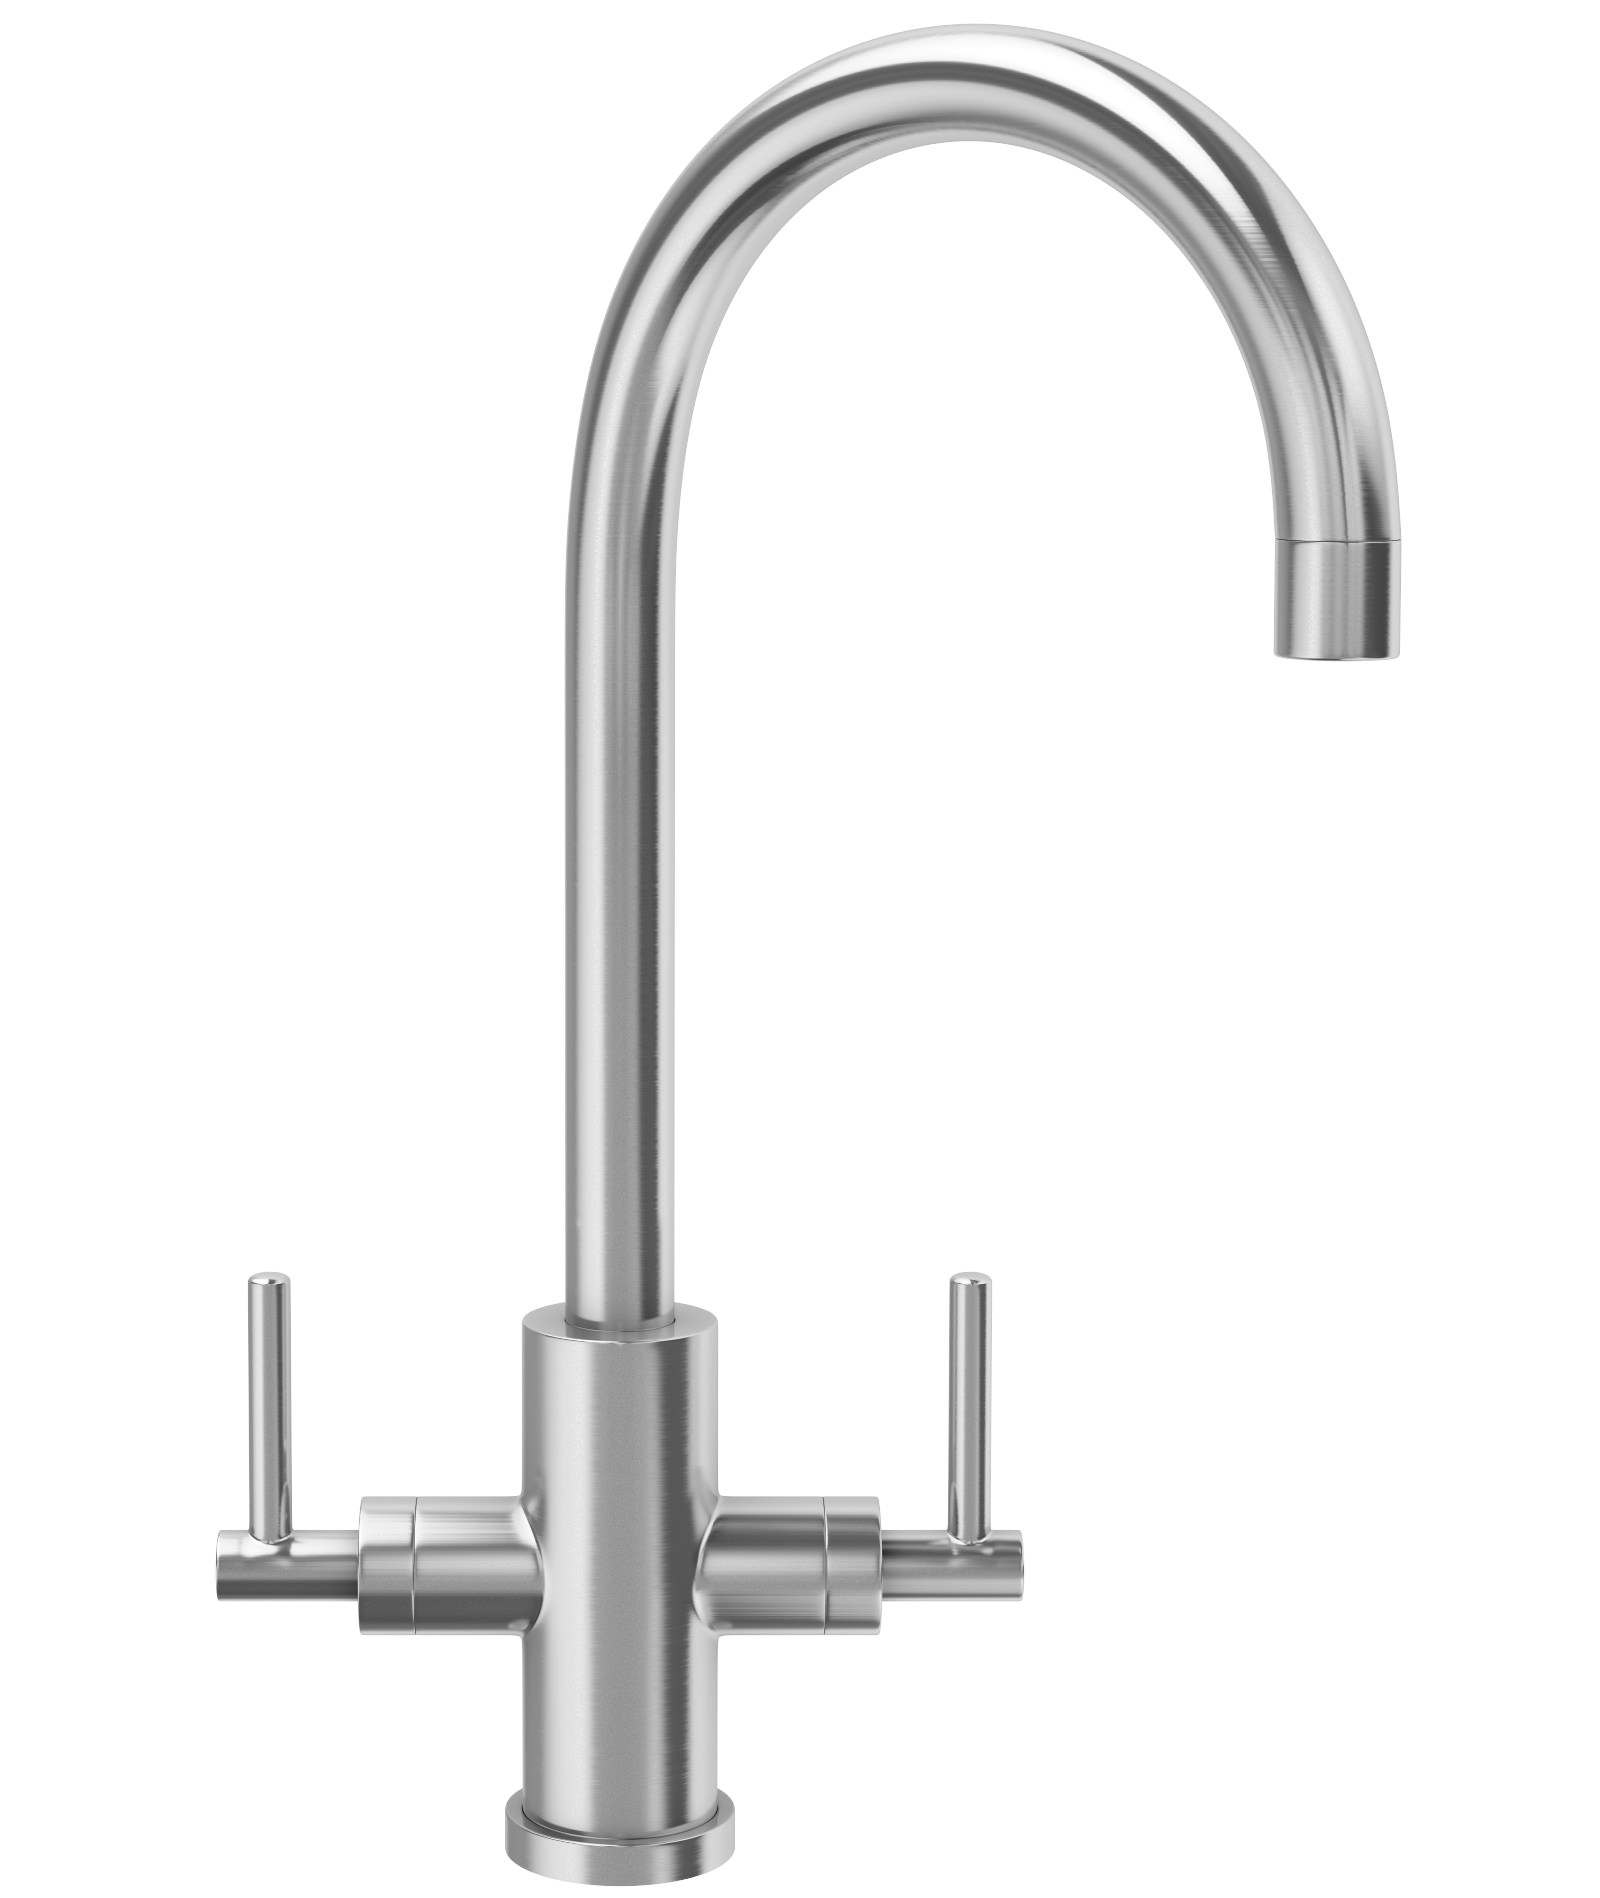 Panto Stainless Steel Kitchen Sink Mixer Tap